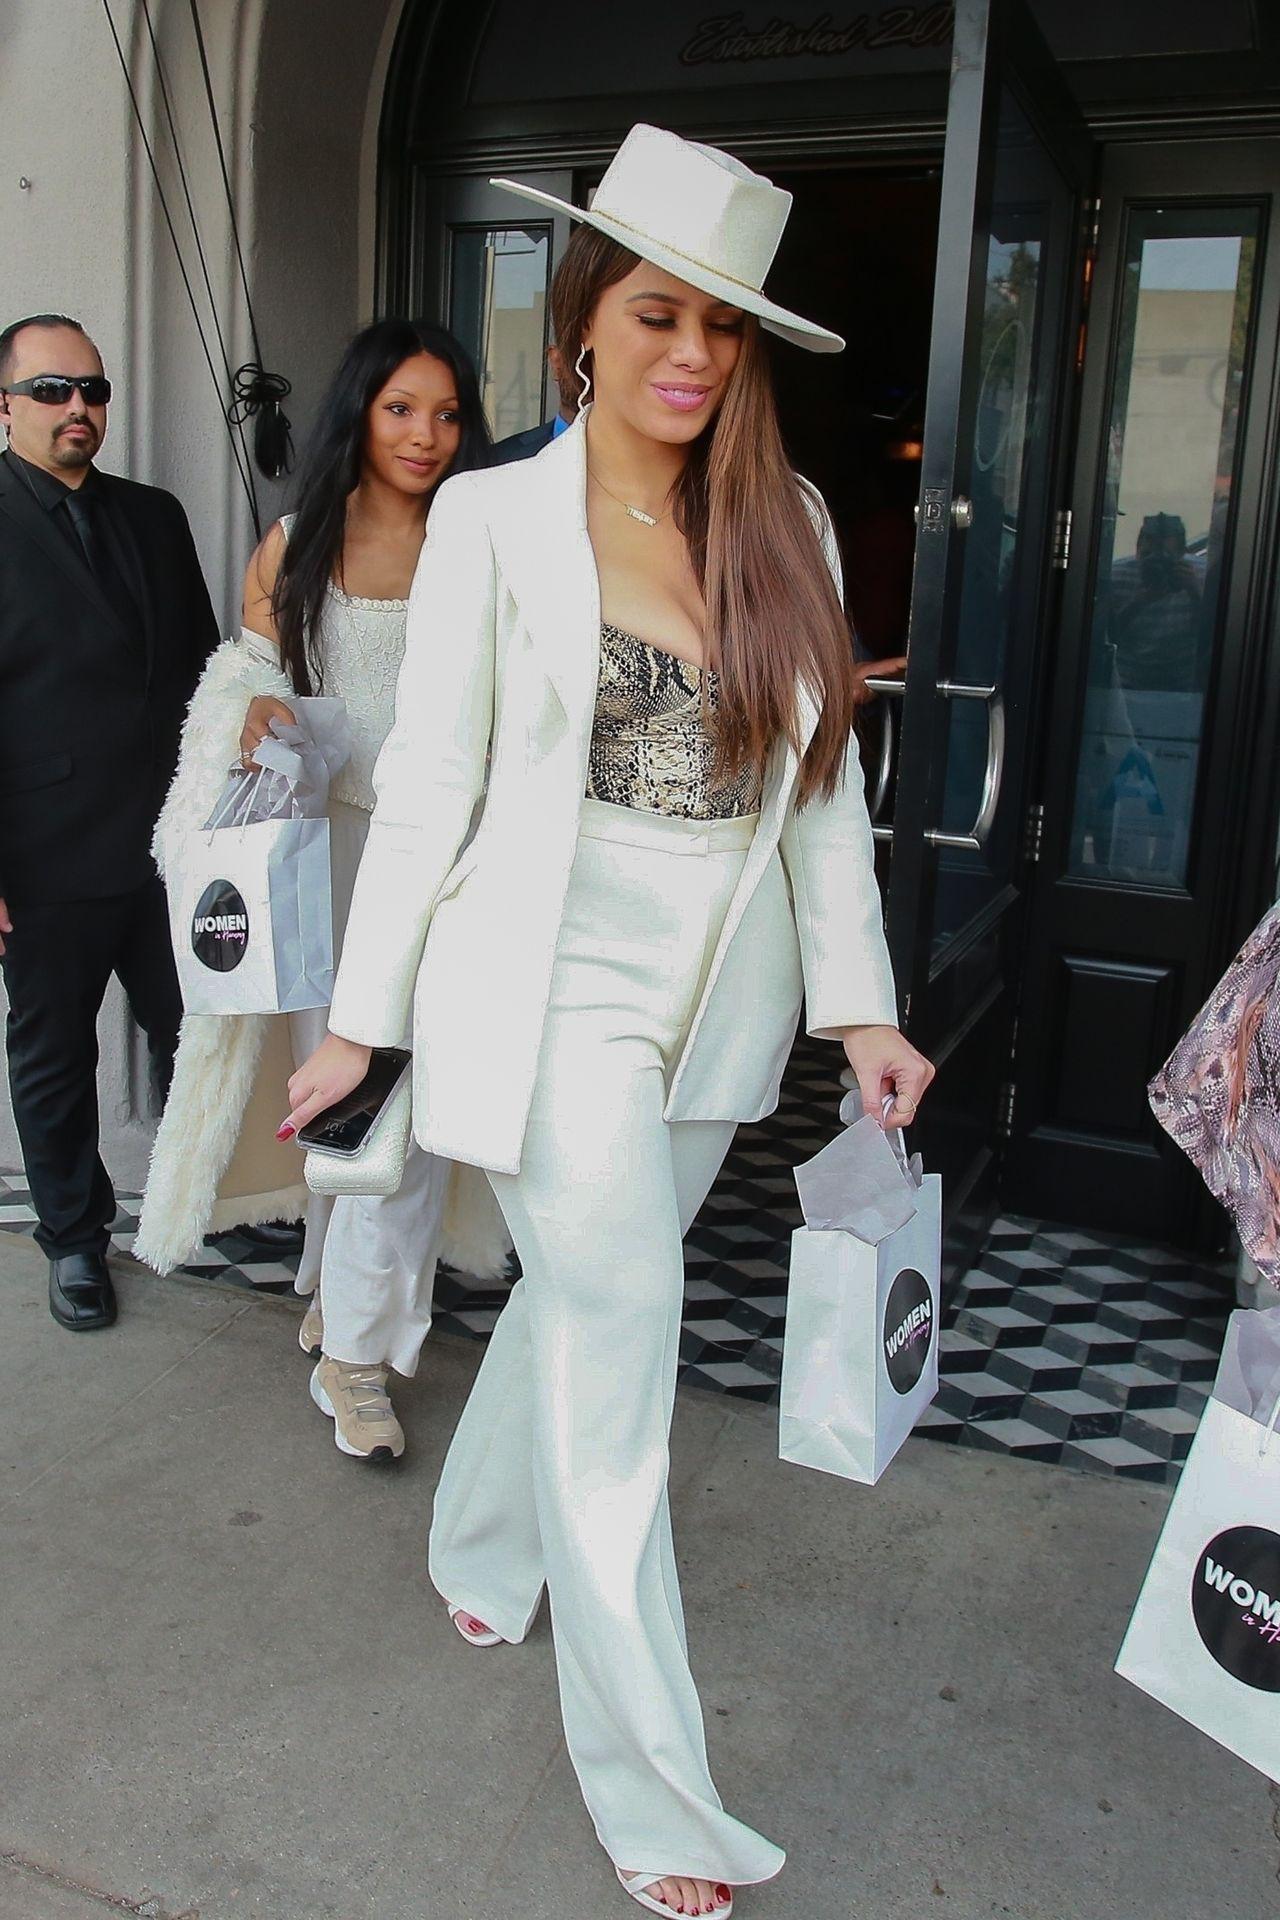 Dinah Jane Departs The Women In Harmony Pre Grammy Luncheon 0010